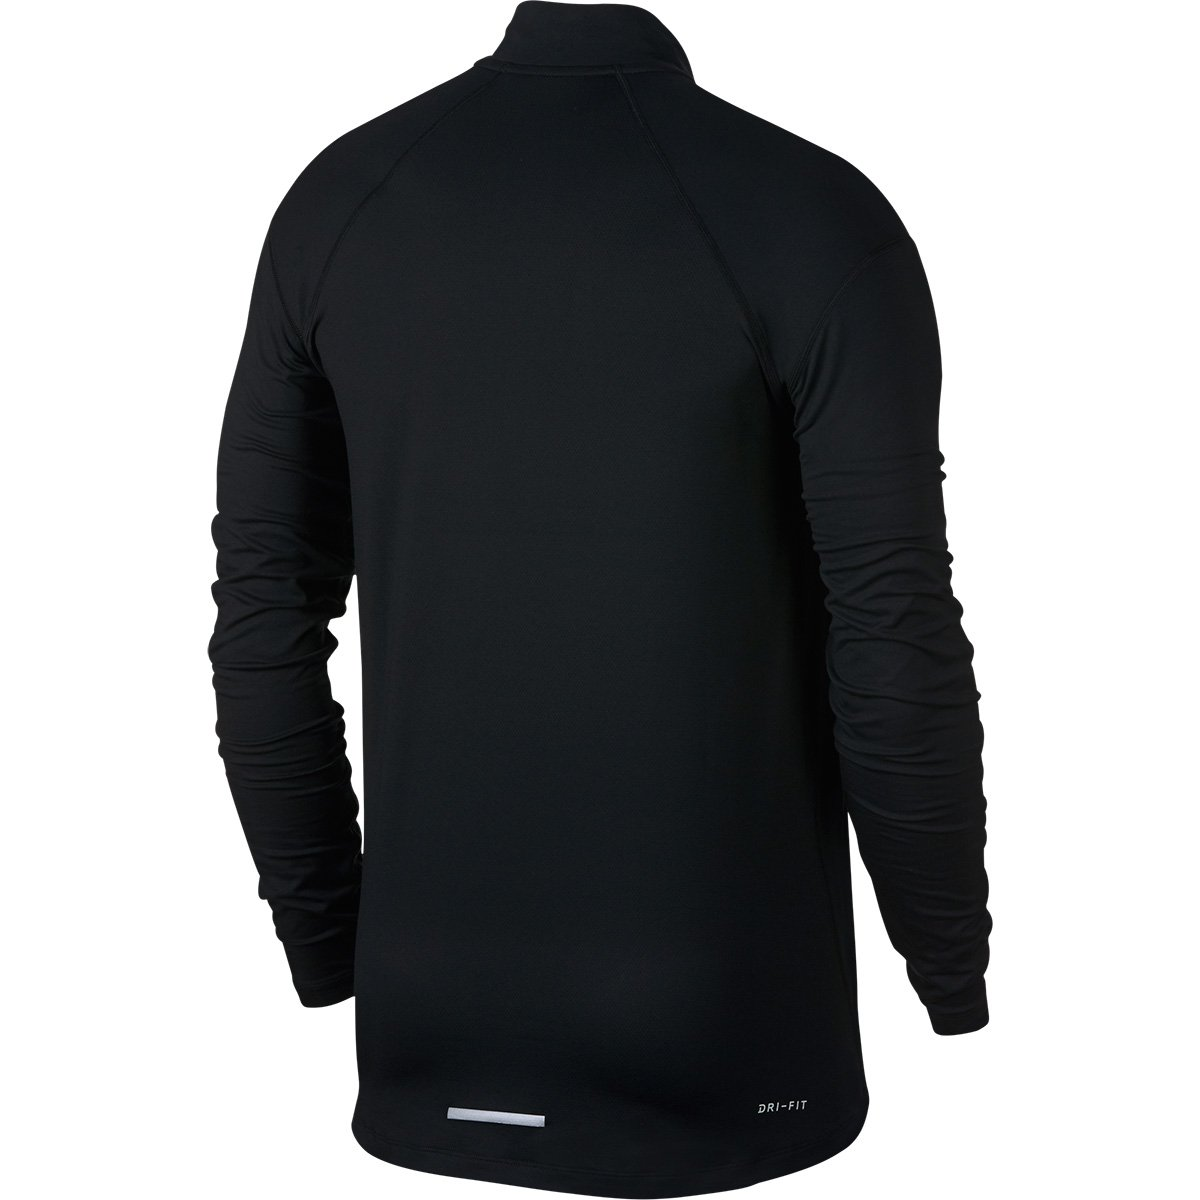 32c4e464553d7 Camiseta Nike Dry Element Top Half-Zip Masculina - Compre Agora ...